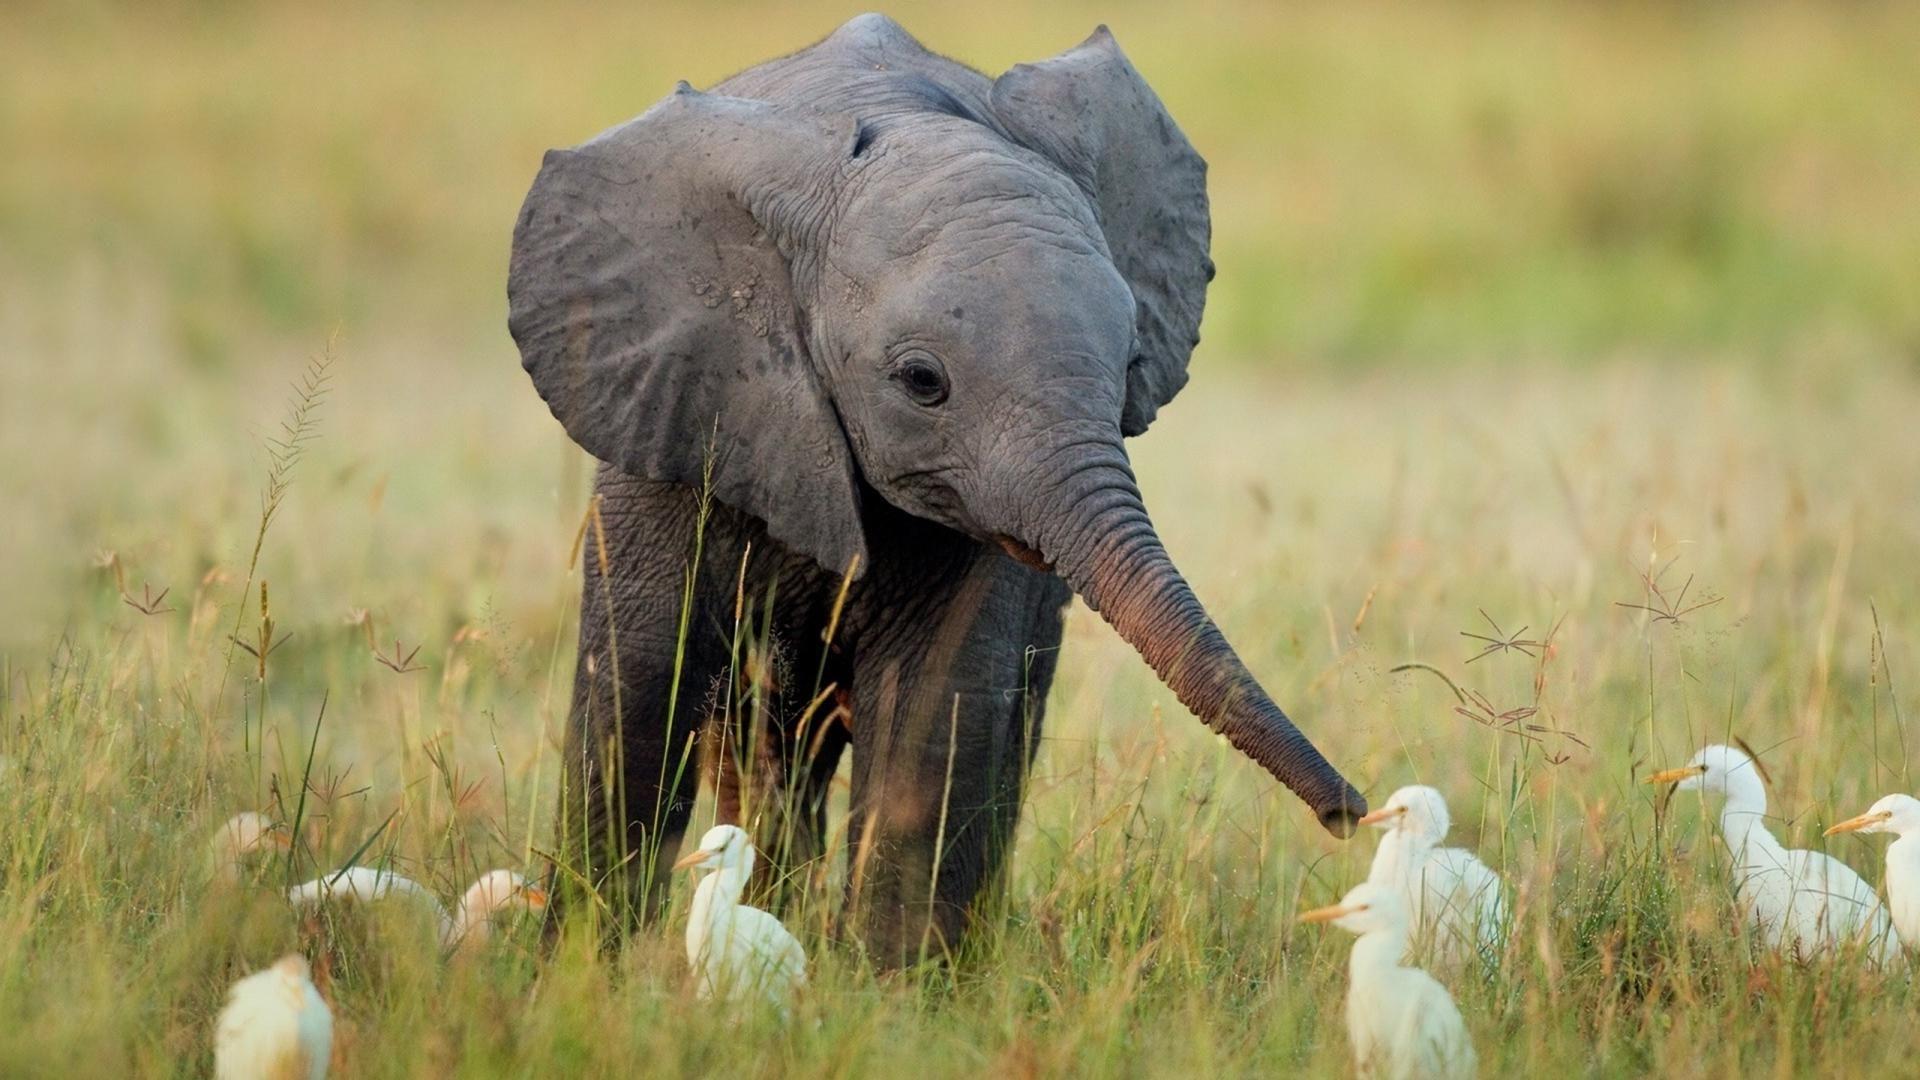 Cute Baby Elephant Hd Wallpaper 1920x1080 Id 40880 Baby Elephant Pictures Cute Animal Pictures Cute Baby Elephant